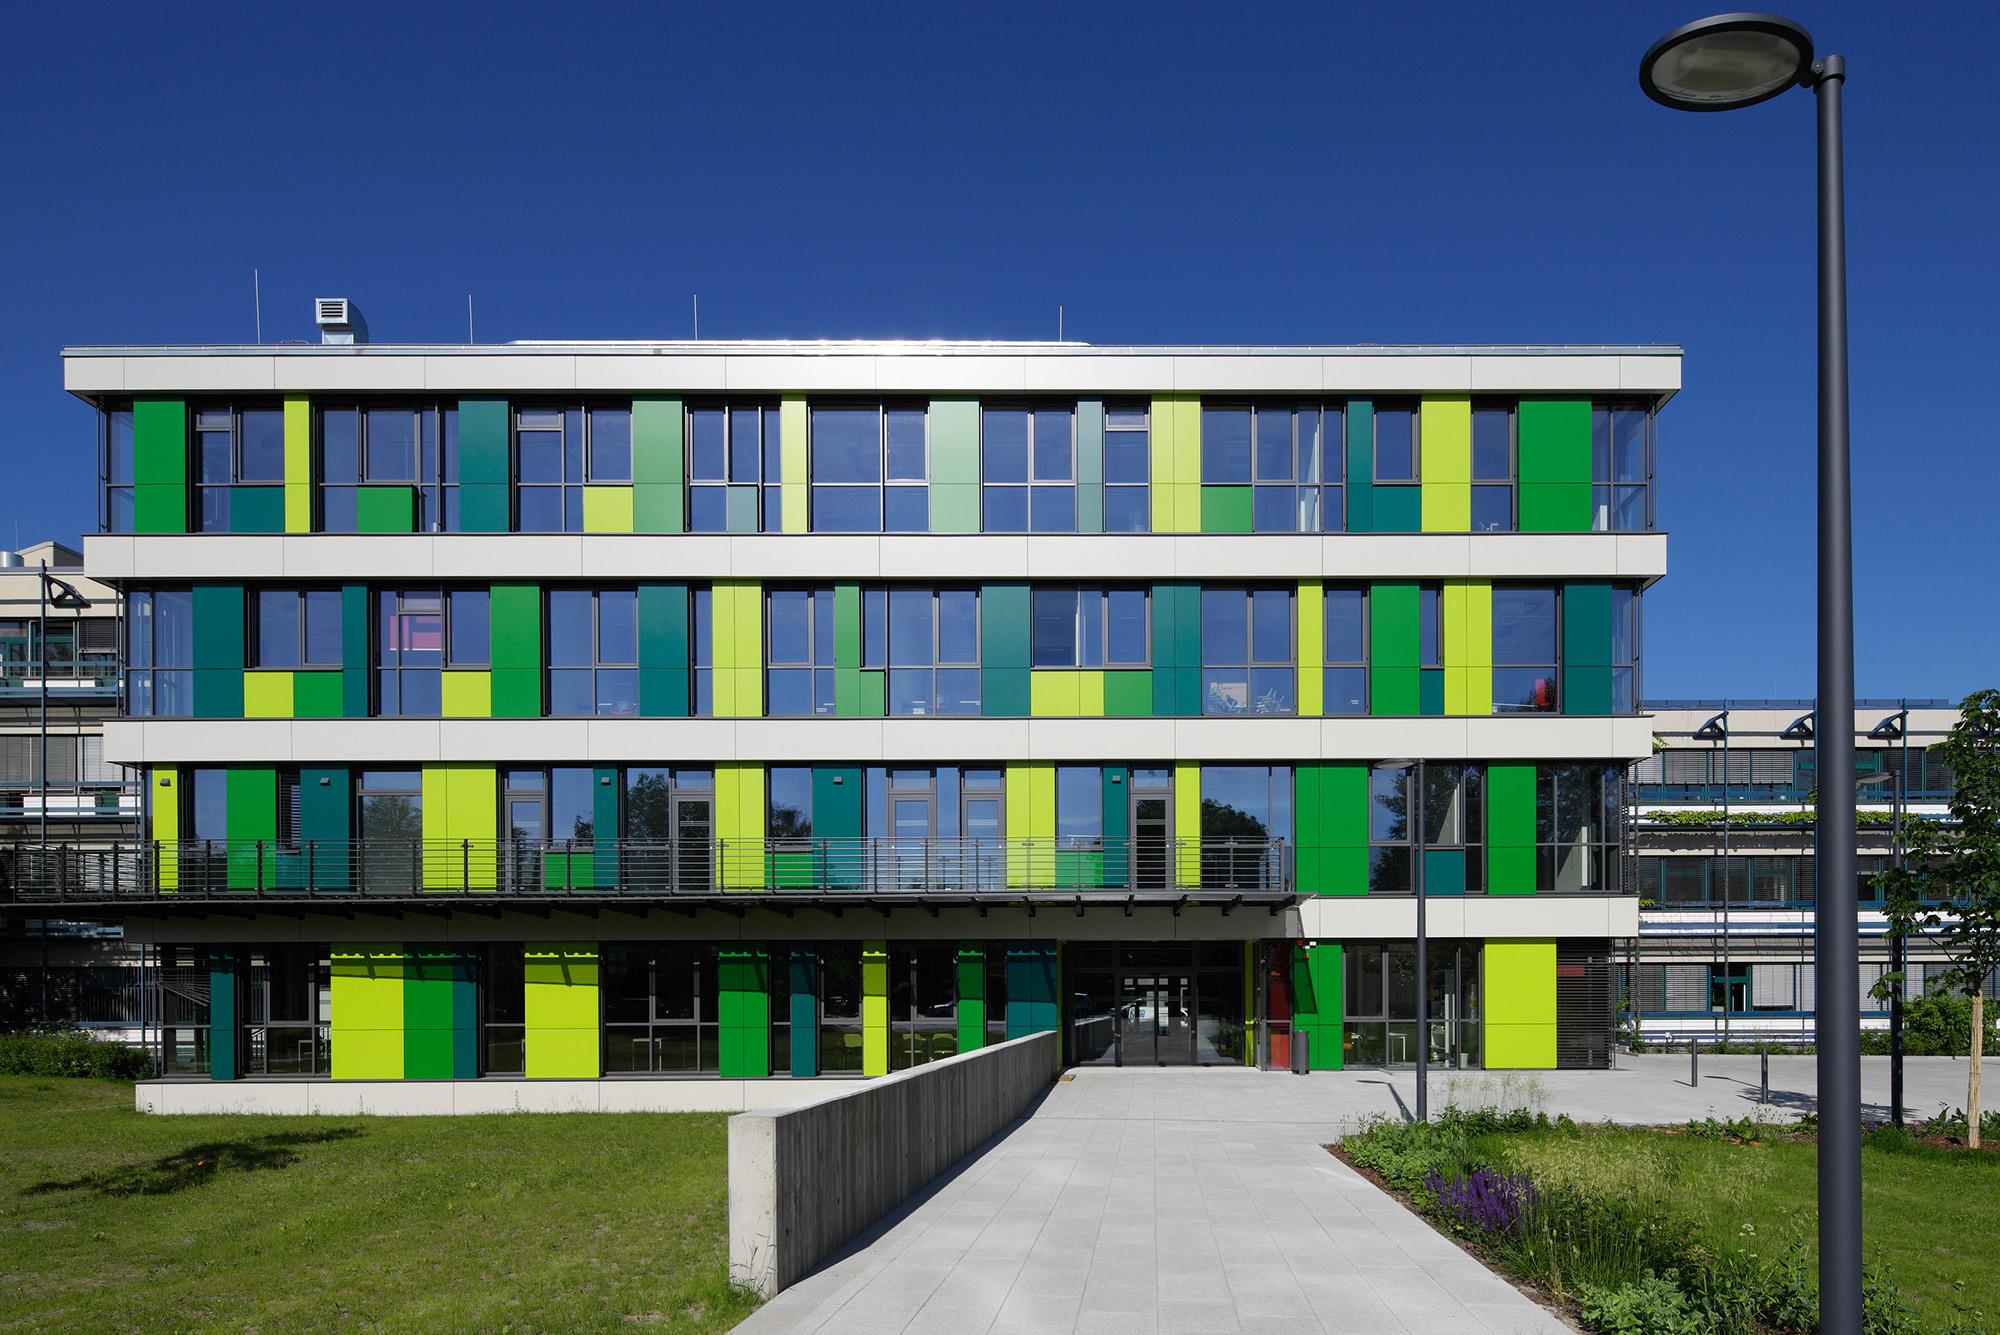 Dgi bauwerk berlin architekten baunetz architekten - Bauwerk architekten ...